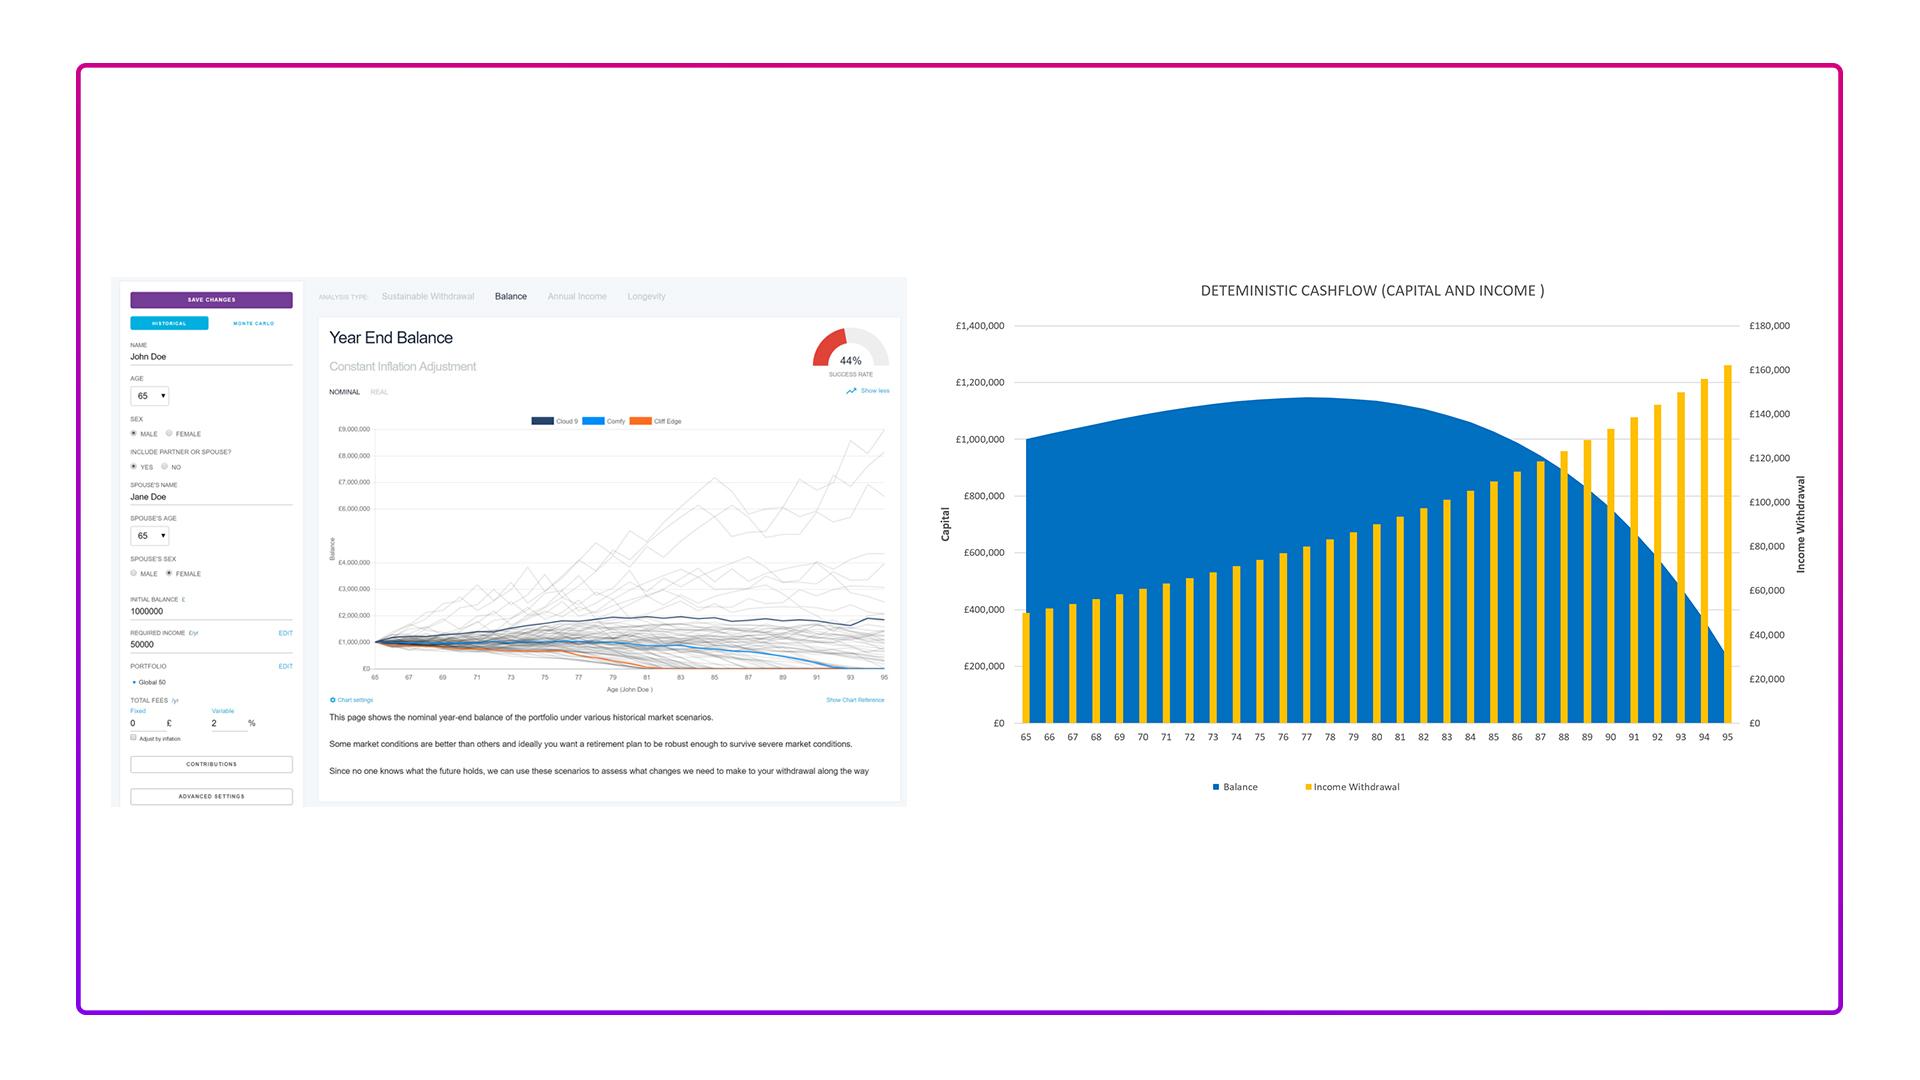 Battle plans, cashflow projections and retirement income planning